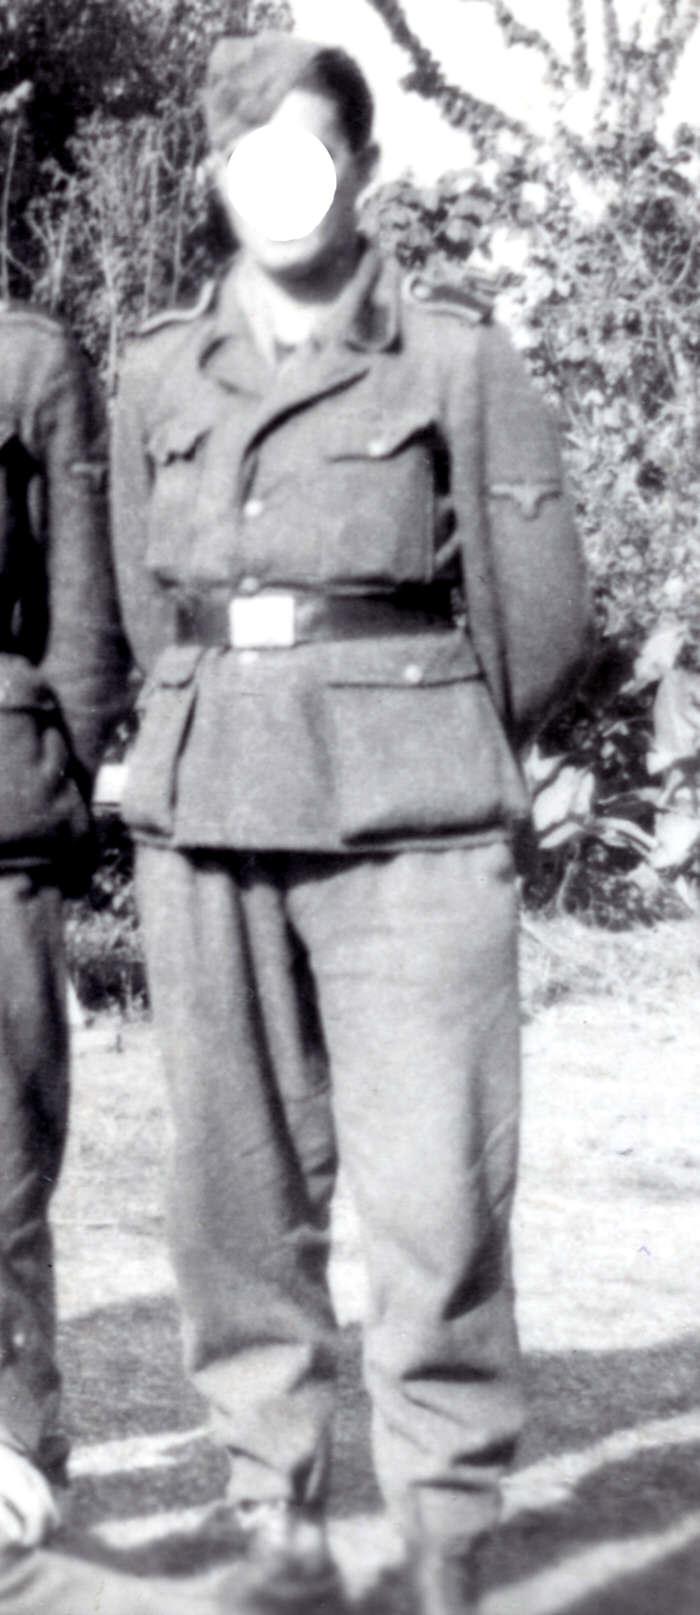 renseignemenst sur cet uniforme Unifor10